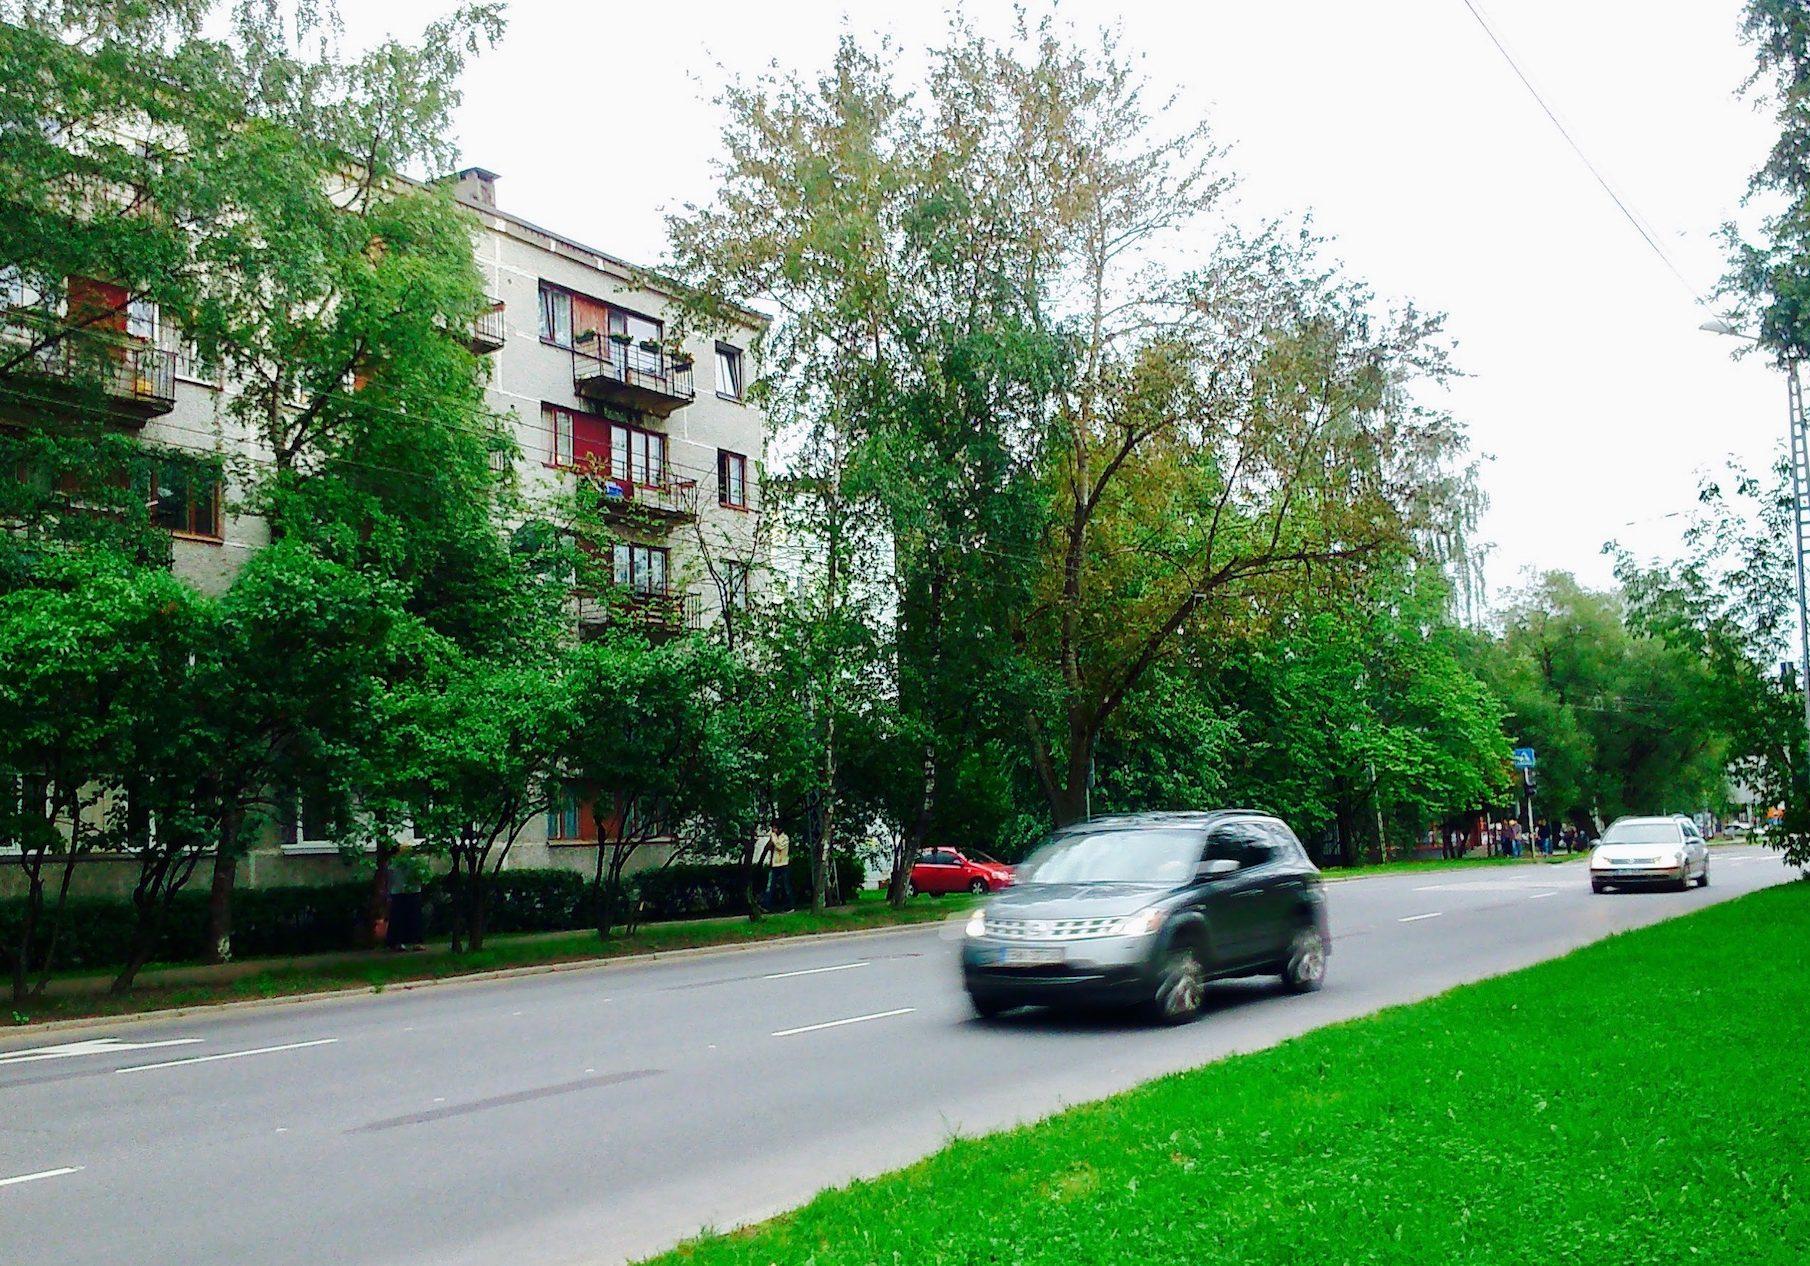 vaidavas-street-purvciems-neighborhood-riga